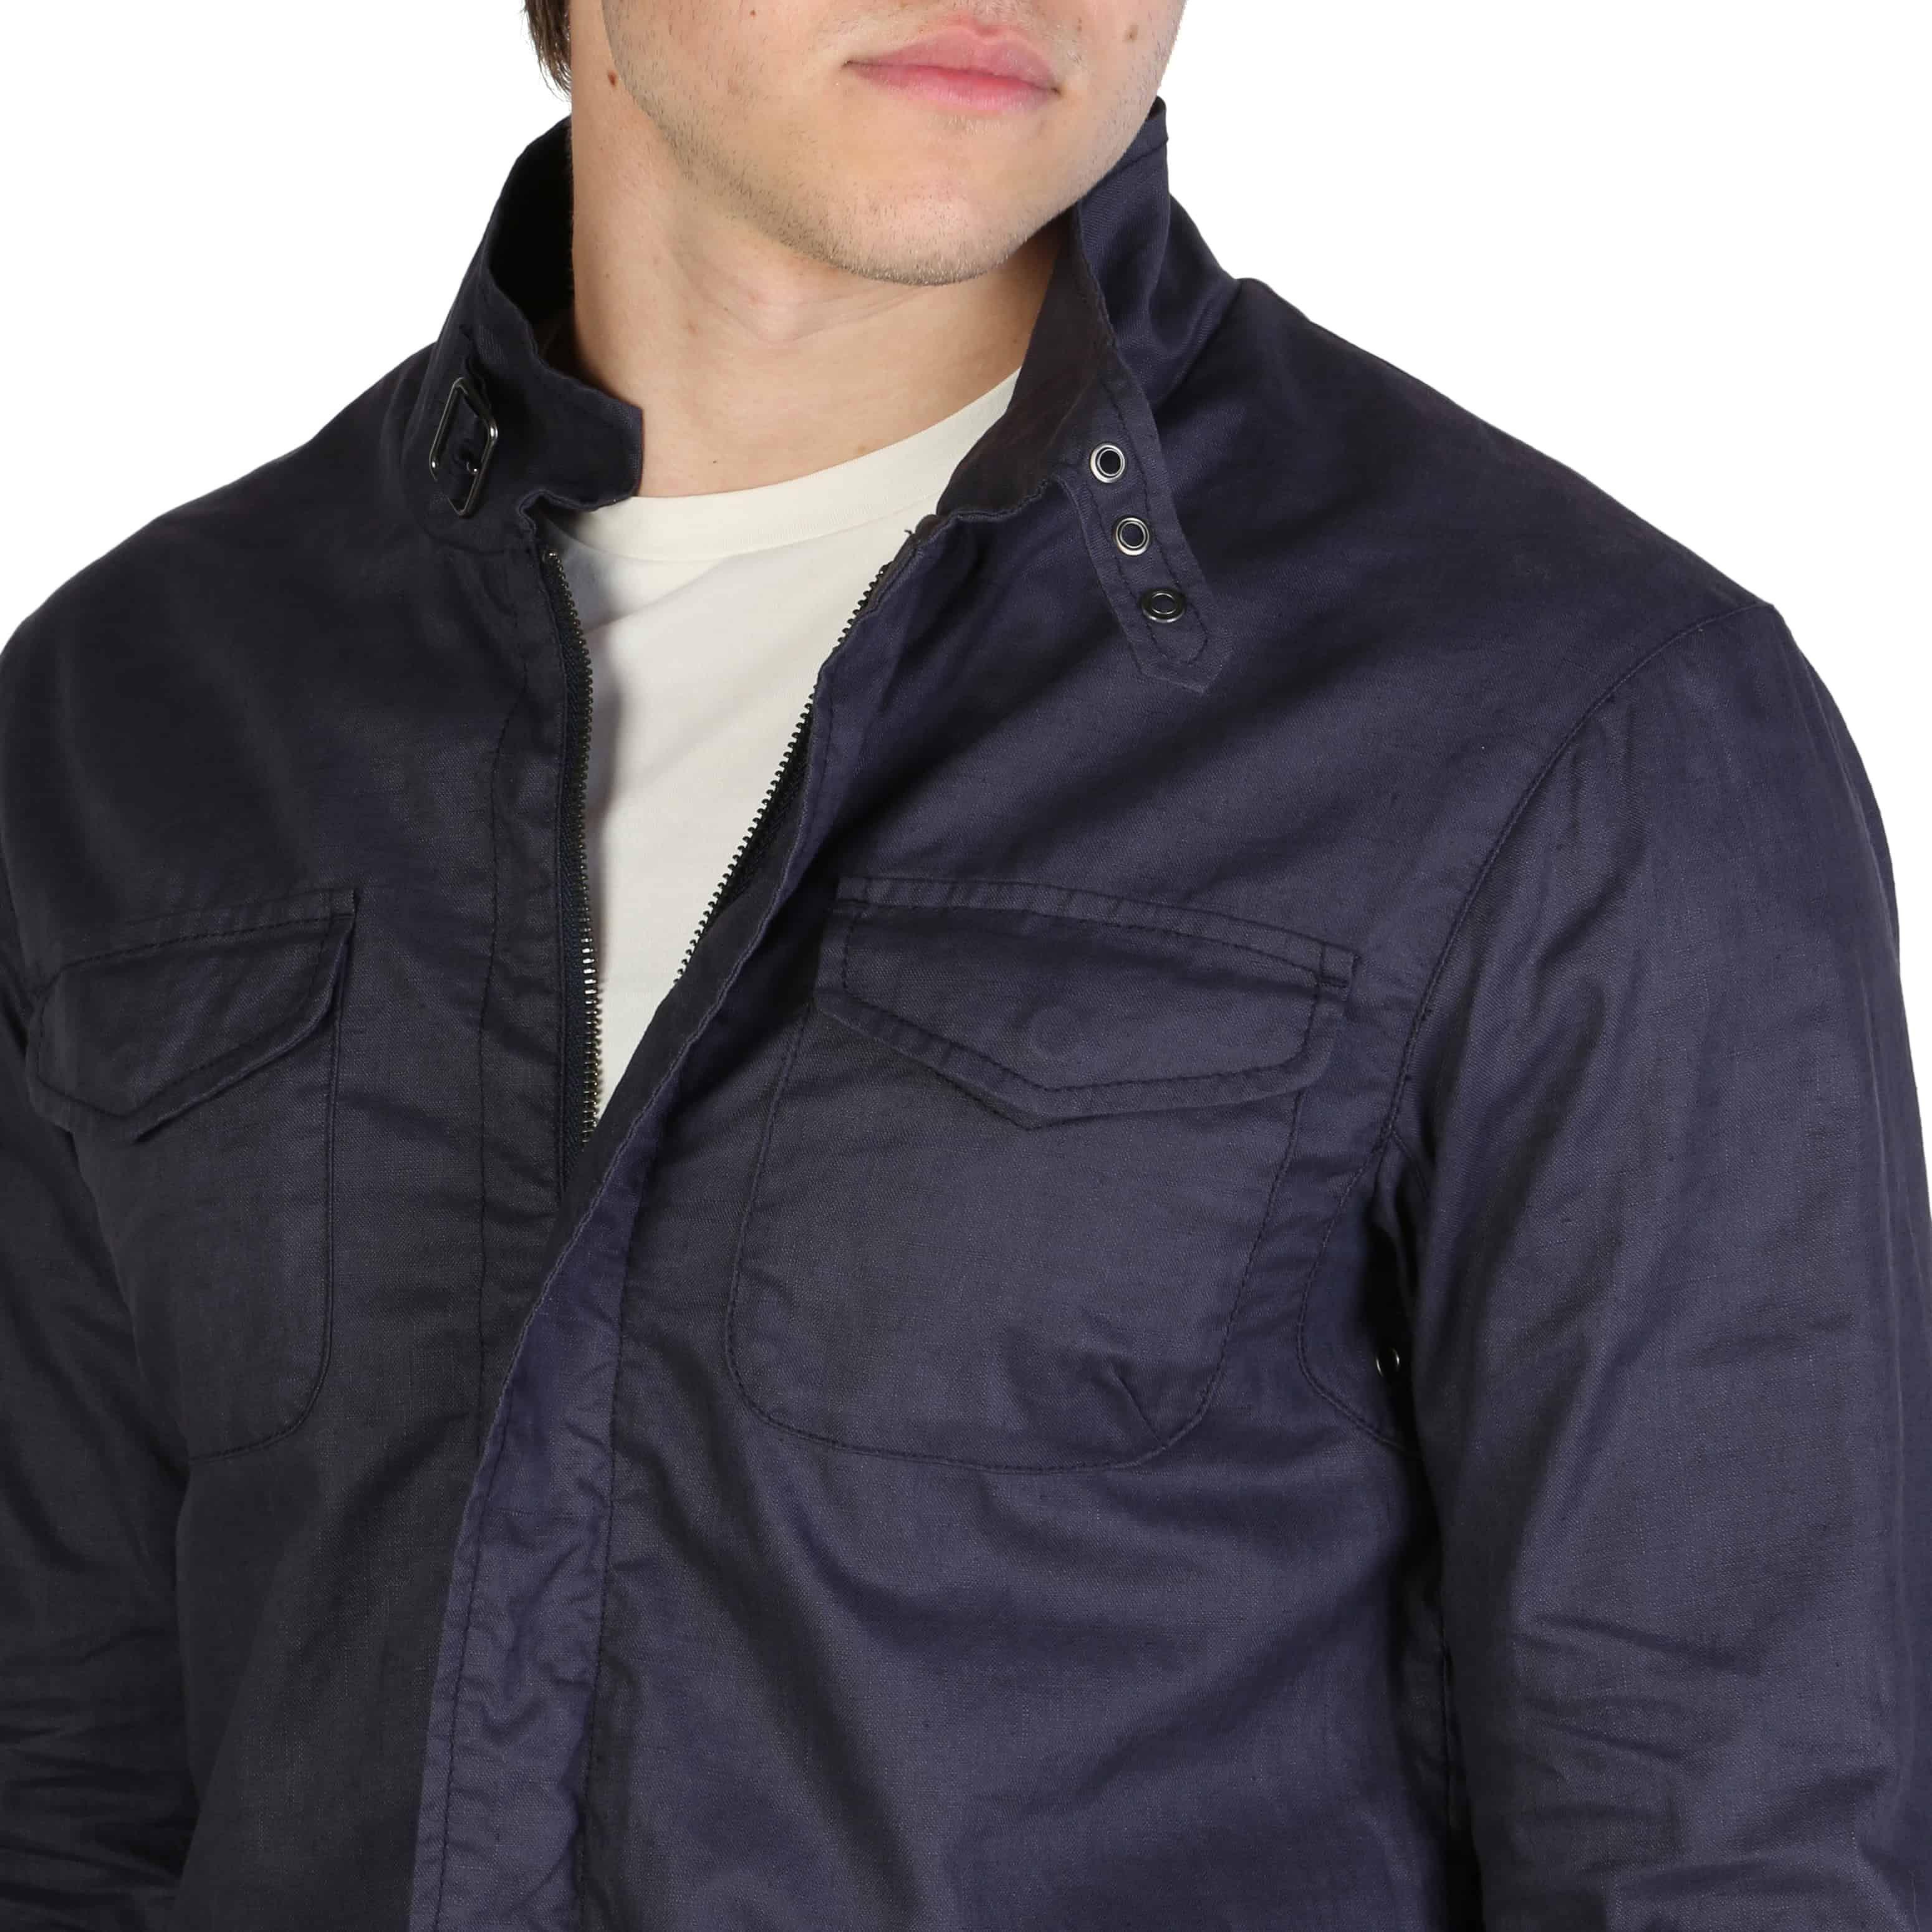 Vestes Armani Jeans – C6K68_ES